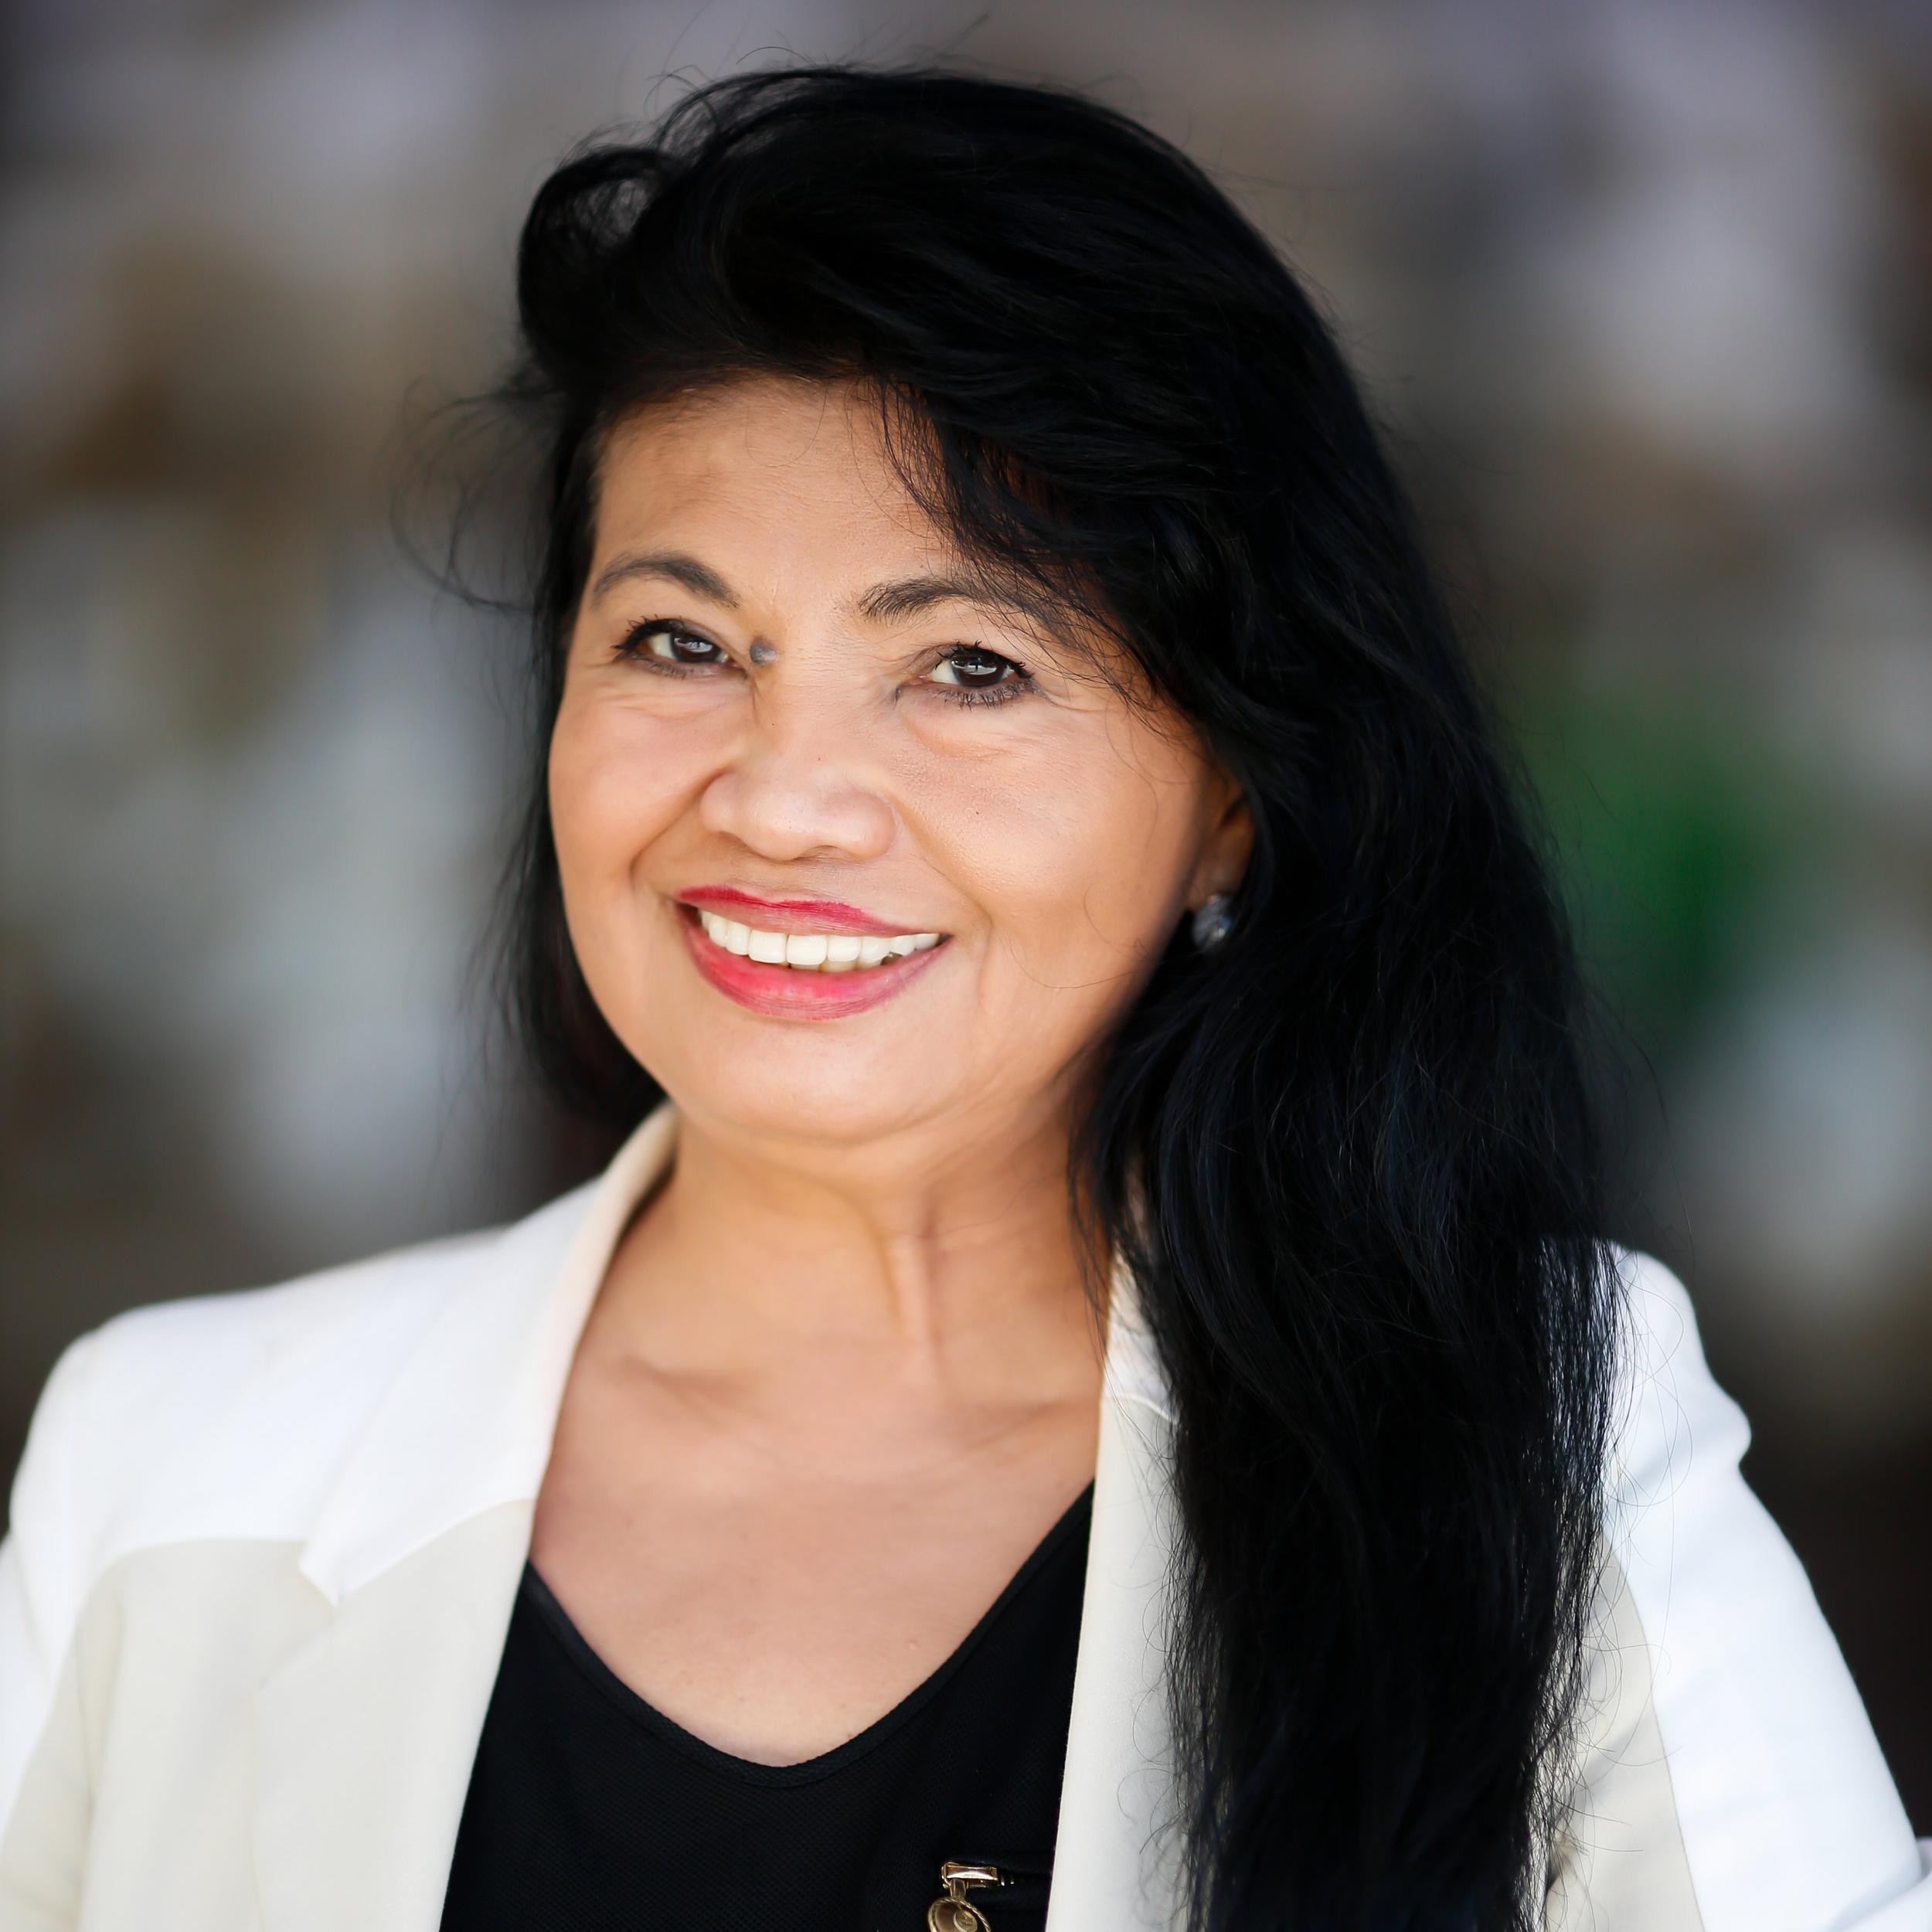 <b>Leonor Vintervoll</b><br>Founder, Philippine Women's<br>Organization (PWO) Resource Center;<br>Board Director & Country<br>Representative, Norway<br>European Network of Filipino<br>Diaspora (ENFiD)